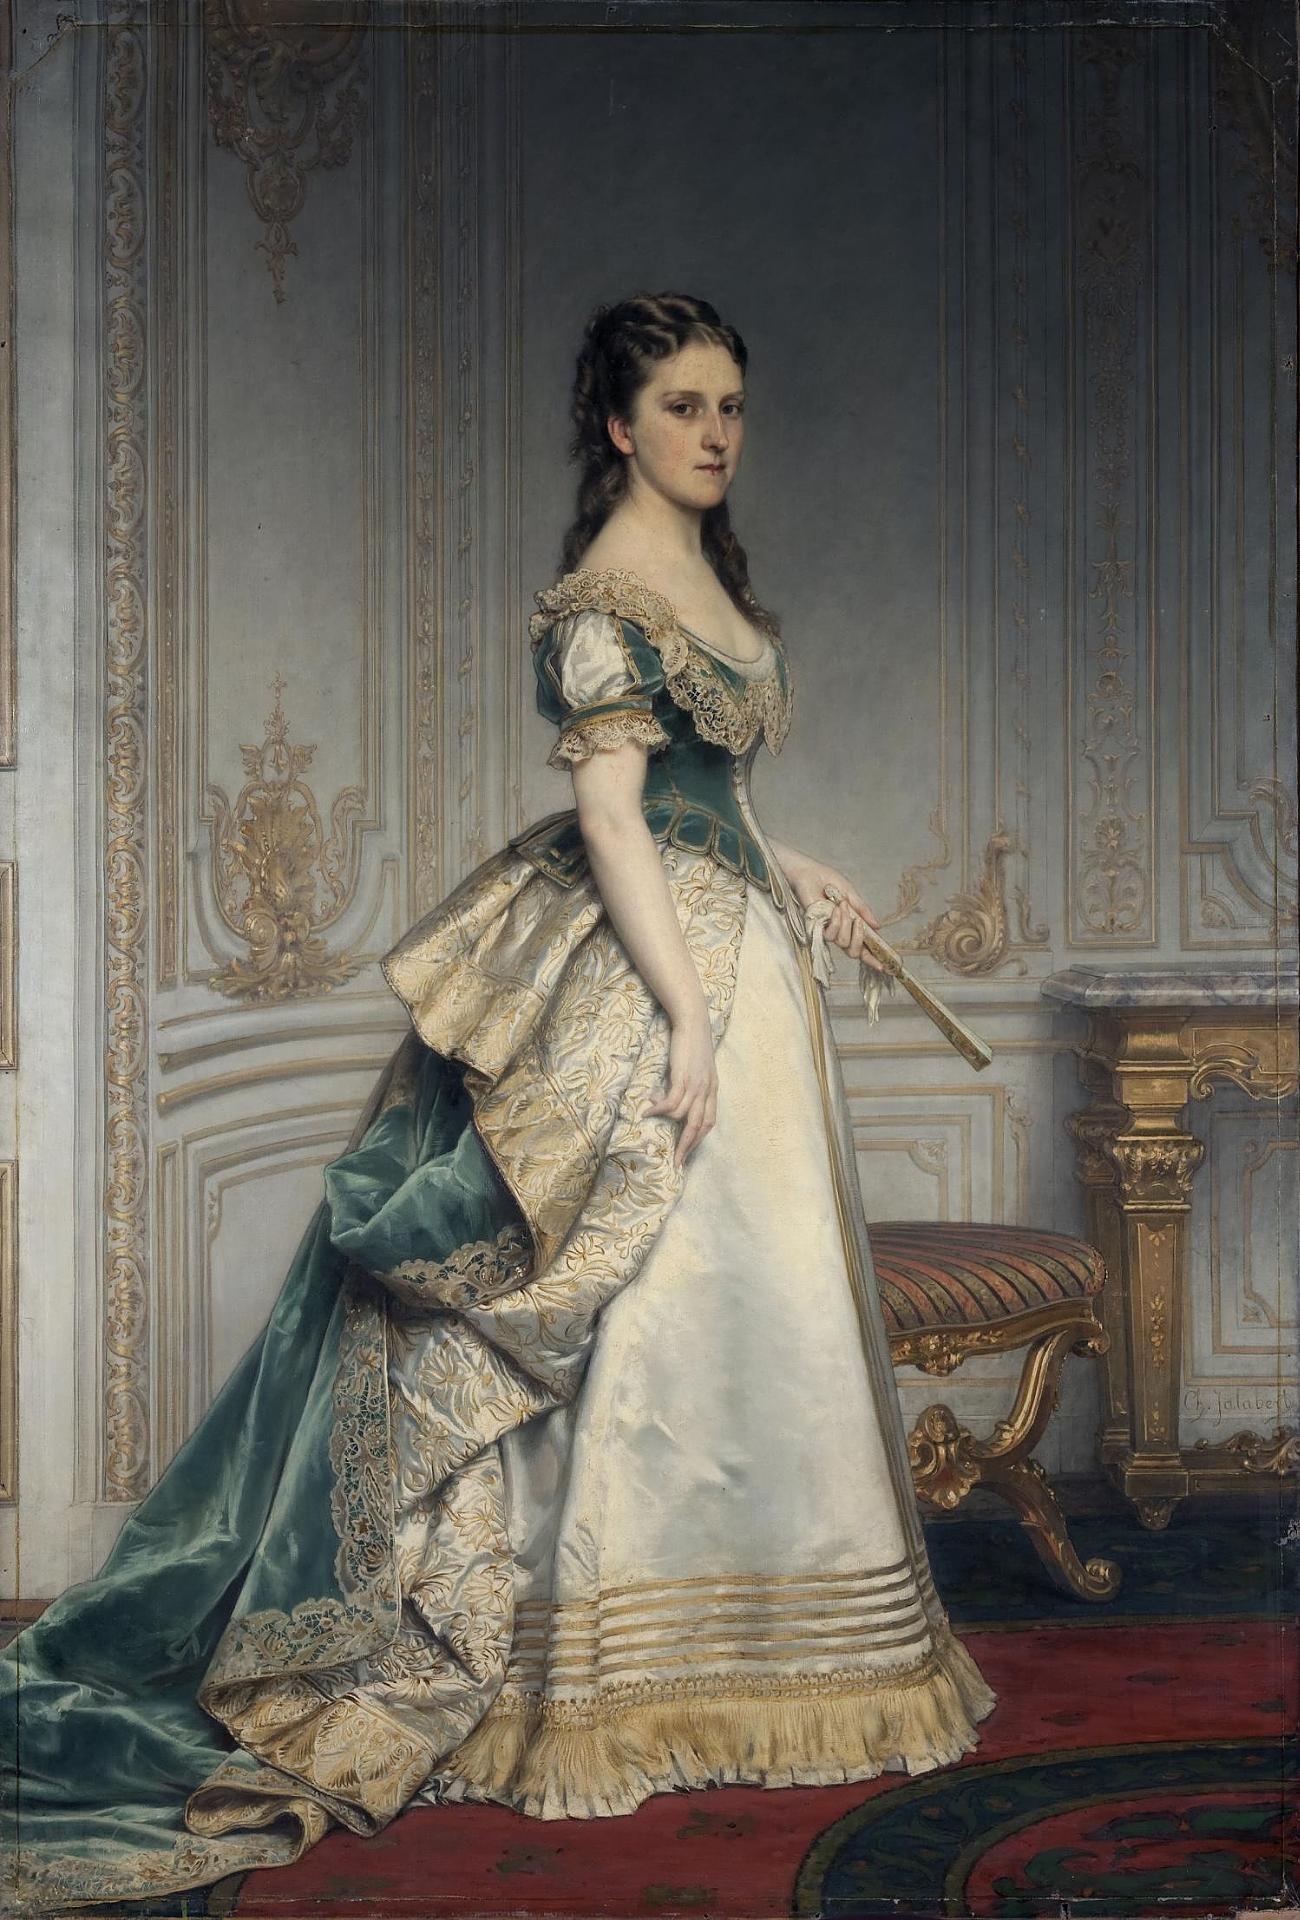 Jalabert, Charles Francois  Portrait of Nadezhda Polovtseva  France, Middle - second half of the 19th century